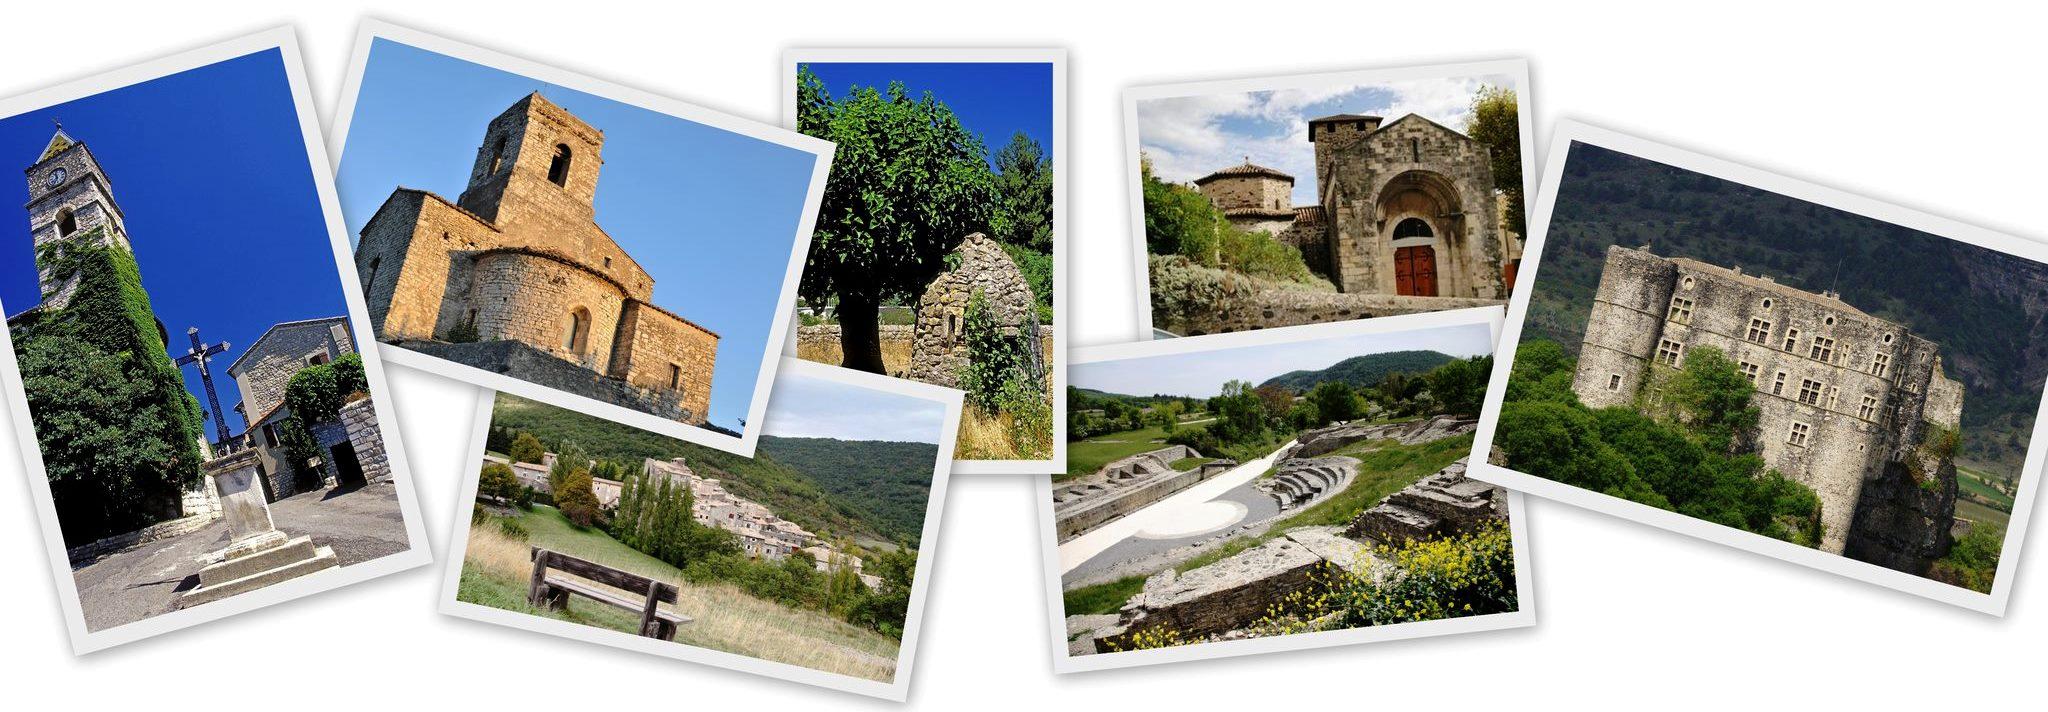 http://static.apidae-tourisme.com/filestore/objets-touristiques/images/164/241/717220.jpg